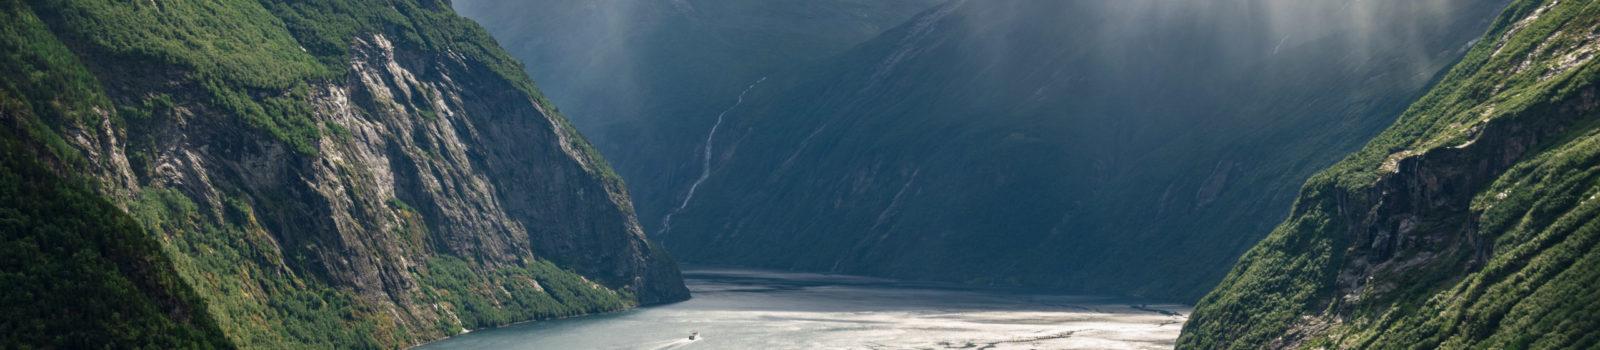 Fotoalbum Wohnmobilreise Norwegen